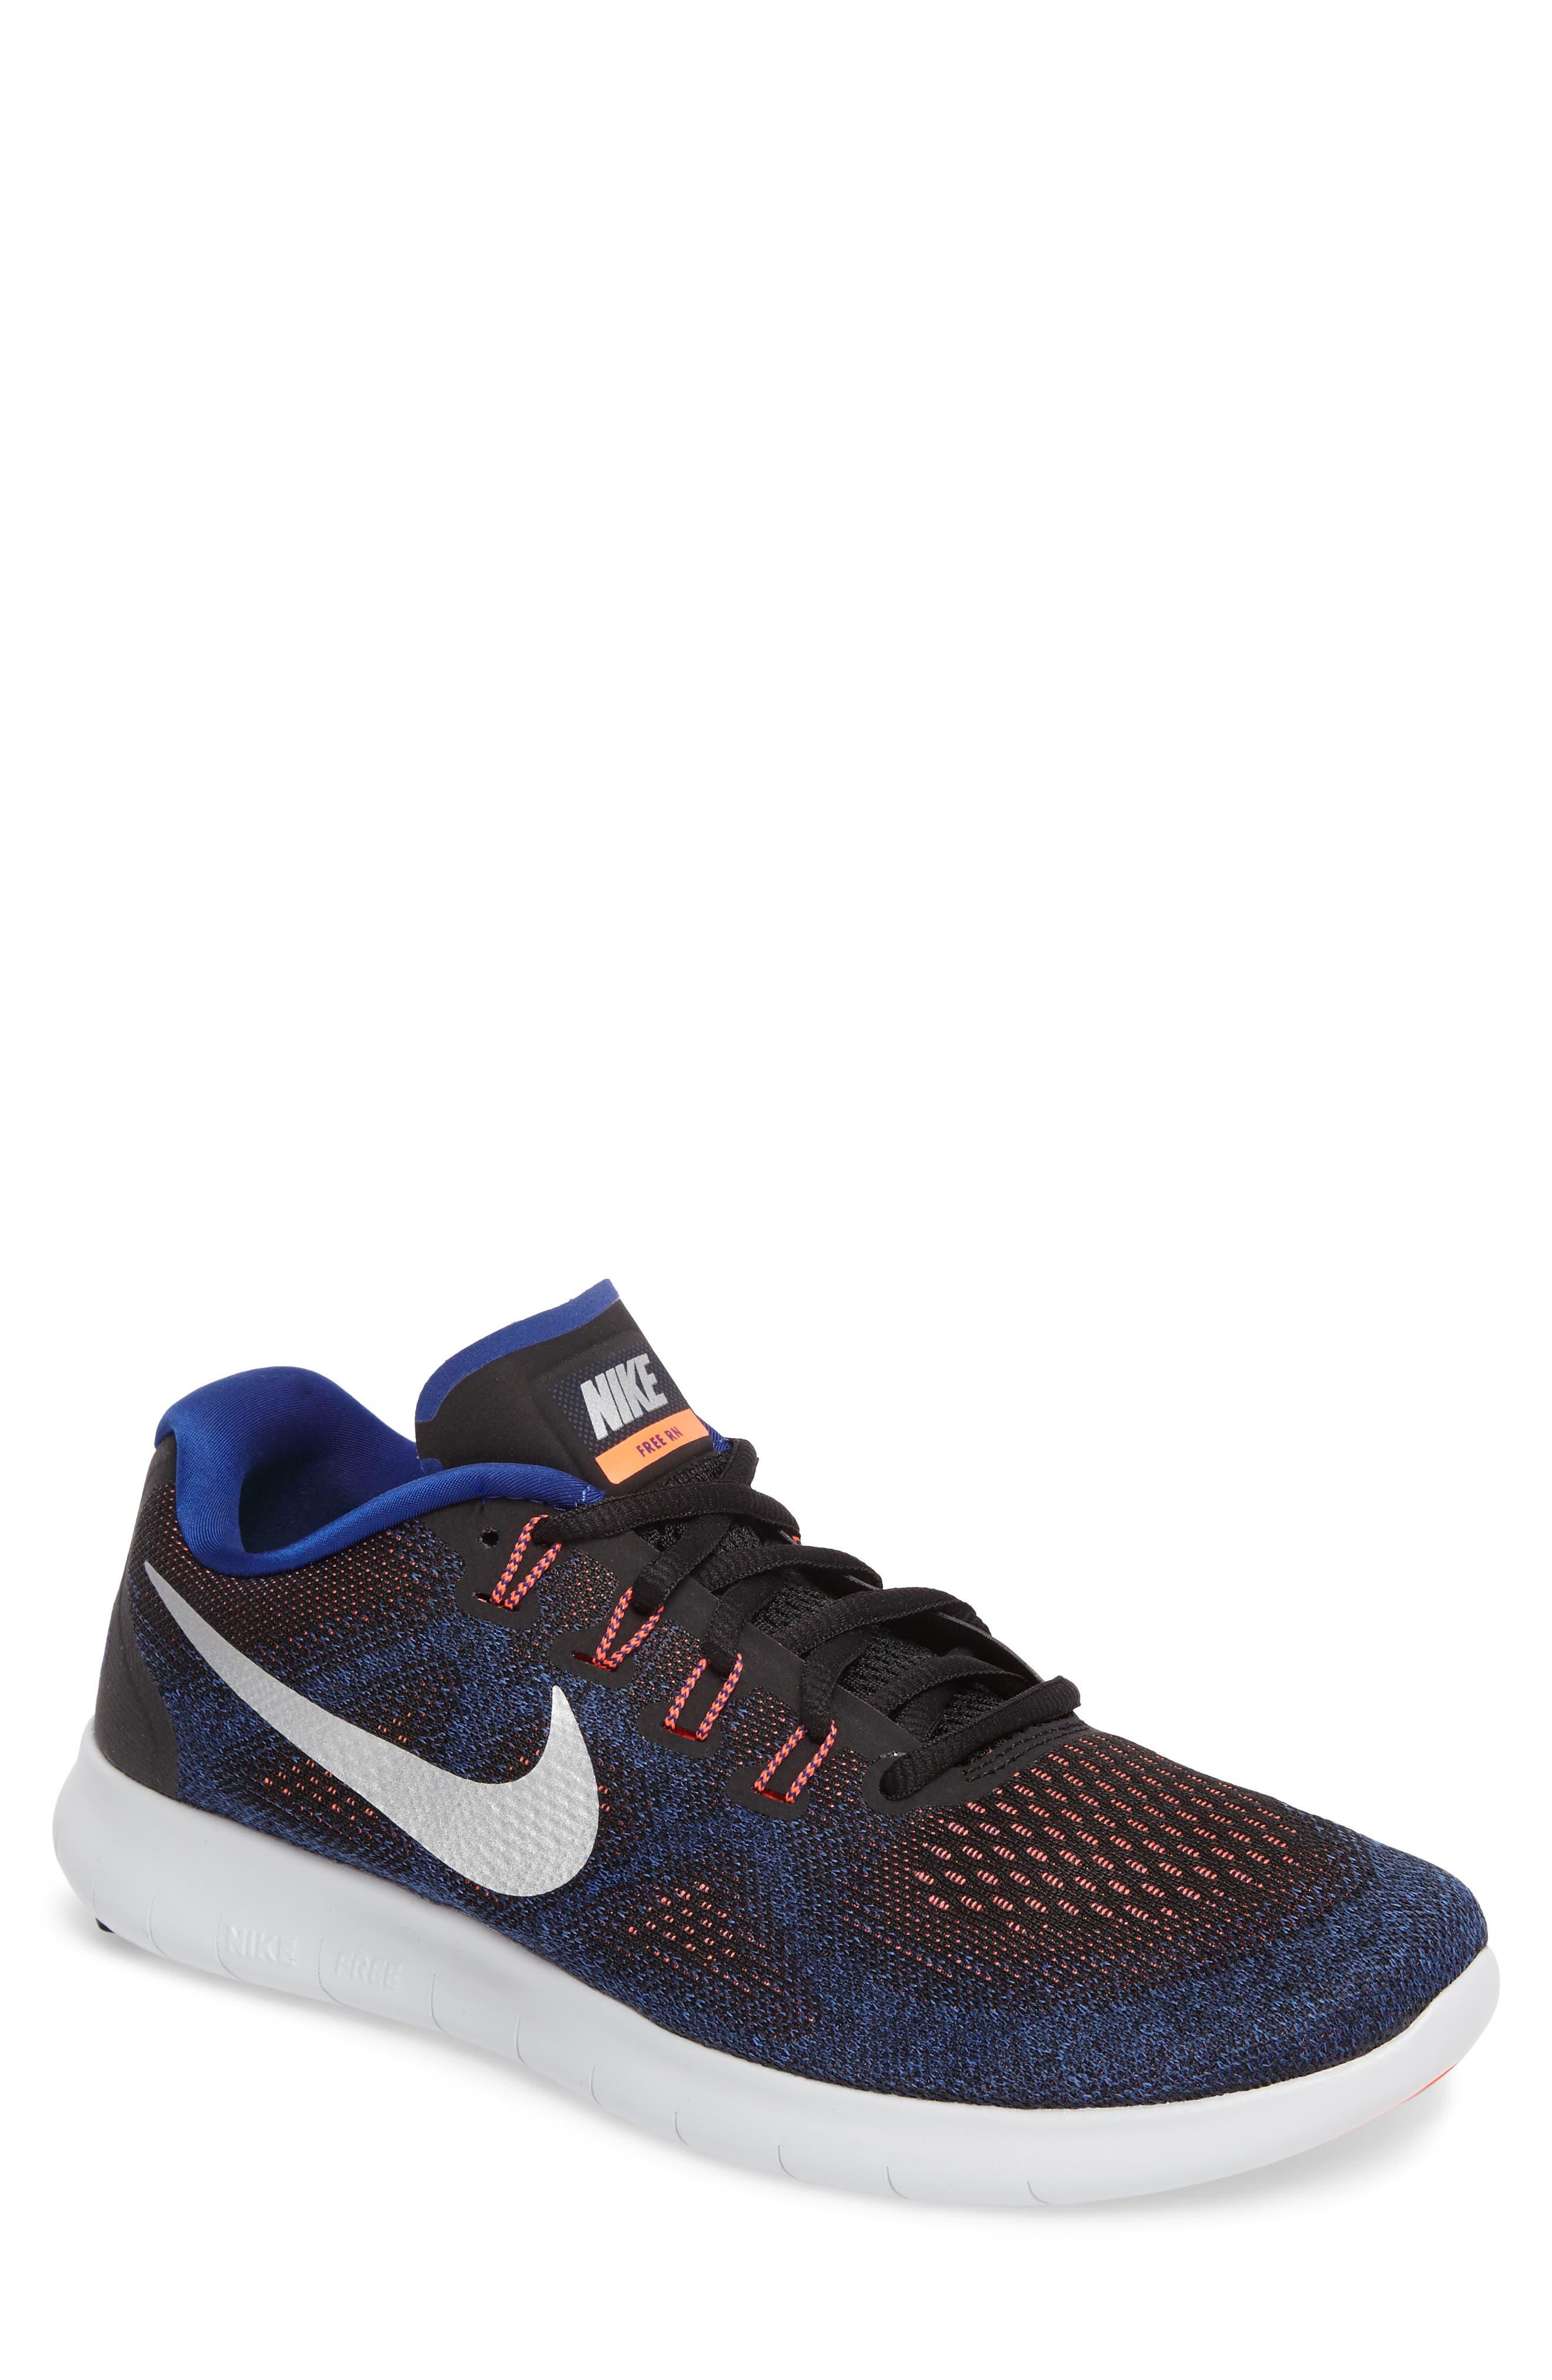 on sale 3b7e3 dbcda Store Nike Free Run Shoe